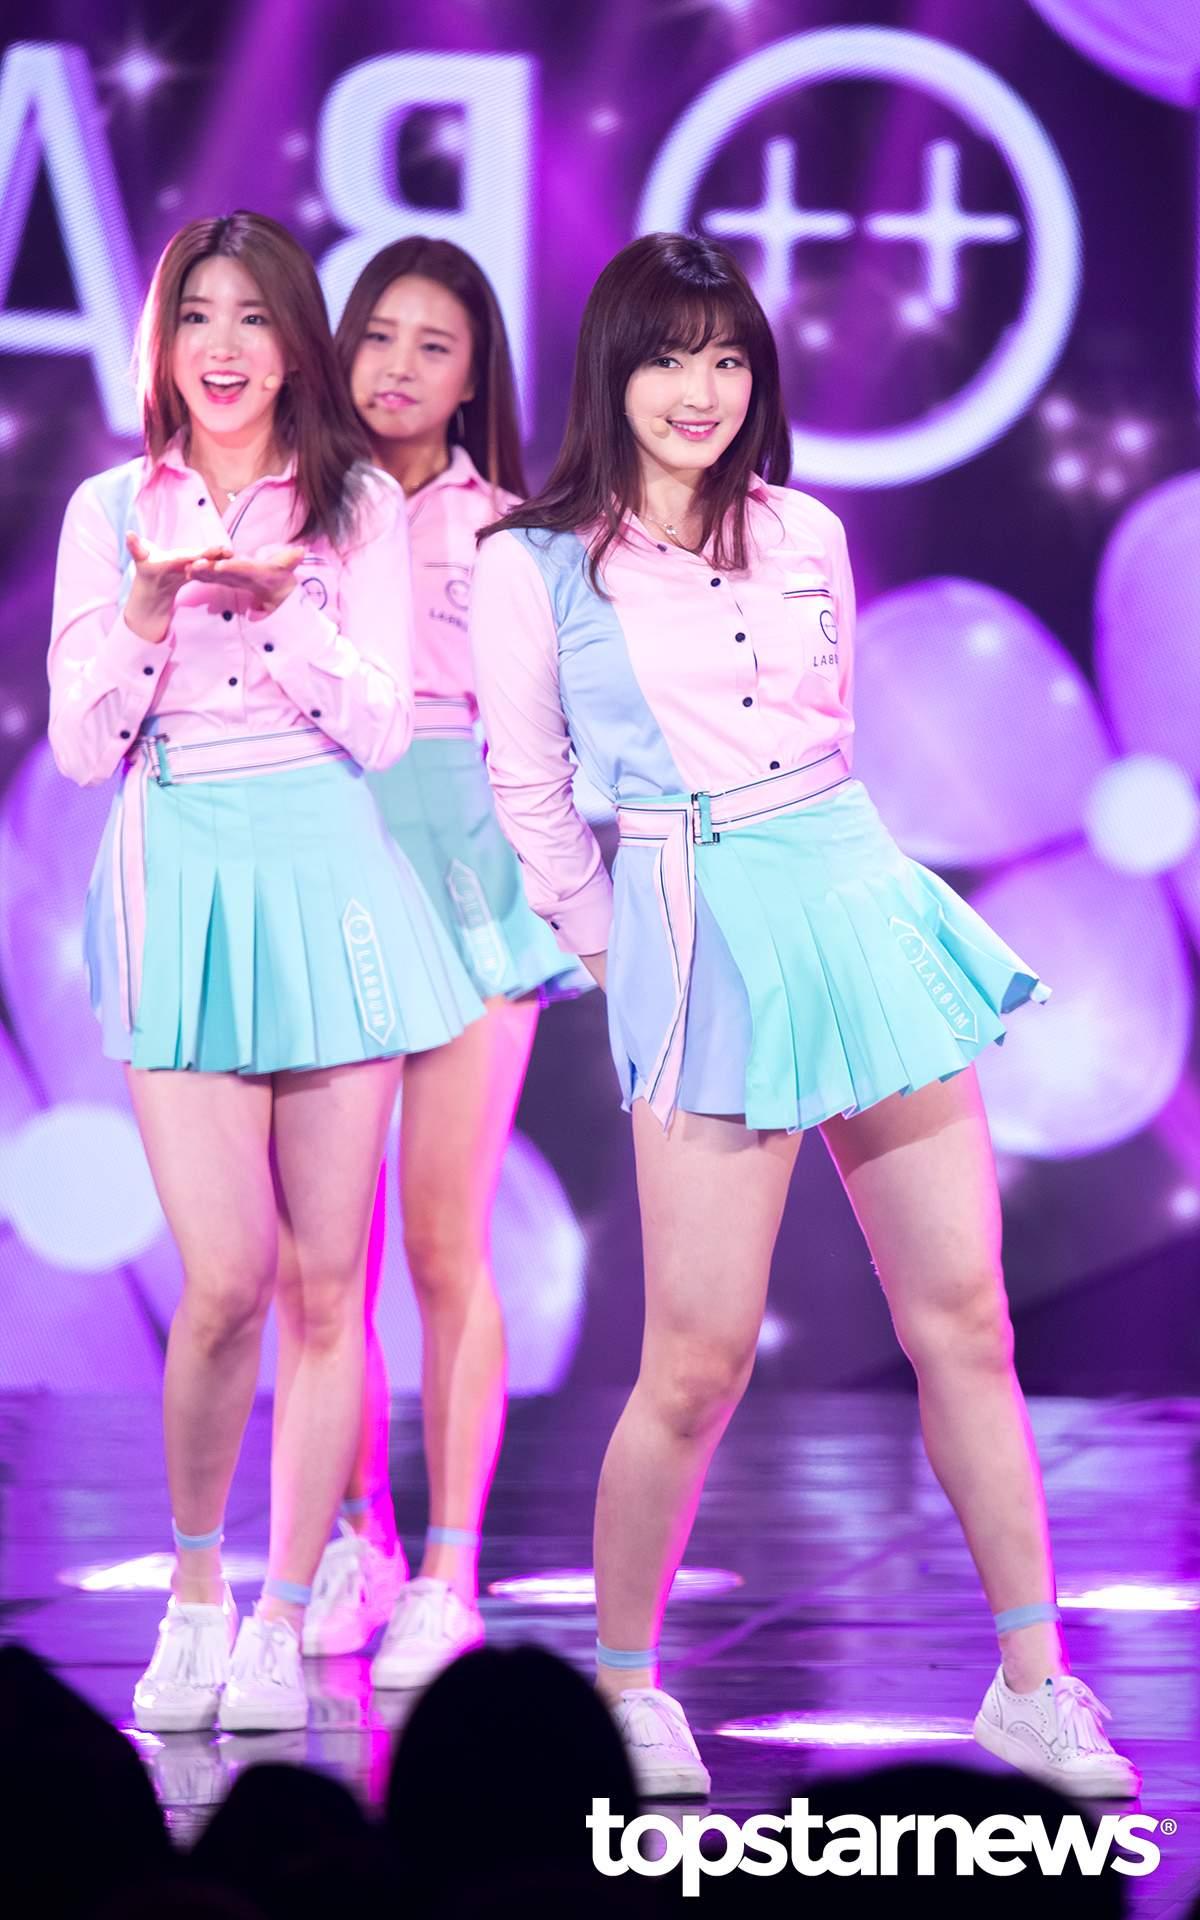 ▼ LABOUM 另一組女團LABOUM同樣穿上了百褶裙,但是整體則是以套裝的方式,以腰帶與粉嫩色調為主打!